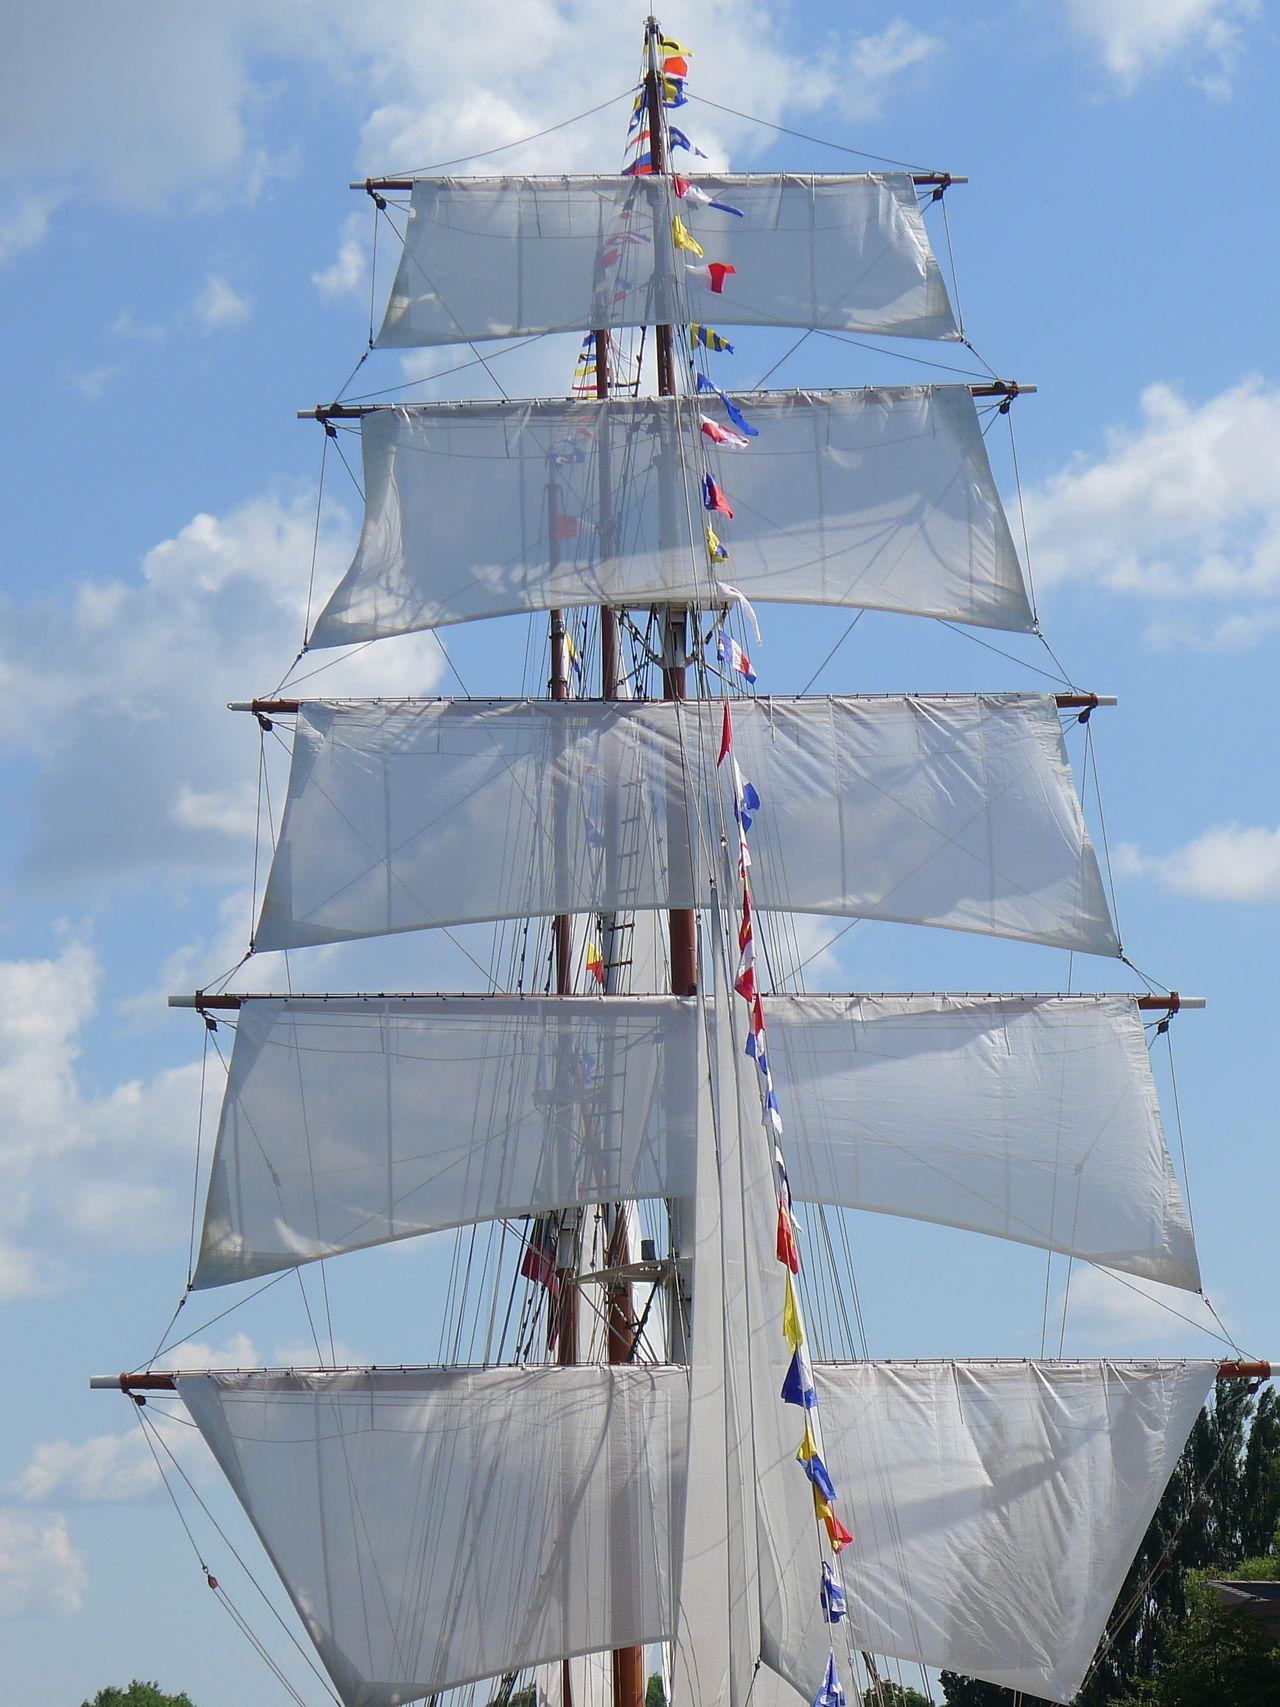 Cloud - Sky Day Mast Nautical Vessel No People Outdoors Sail Sailing Sailing Ship Sky